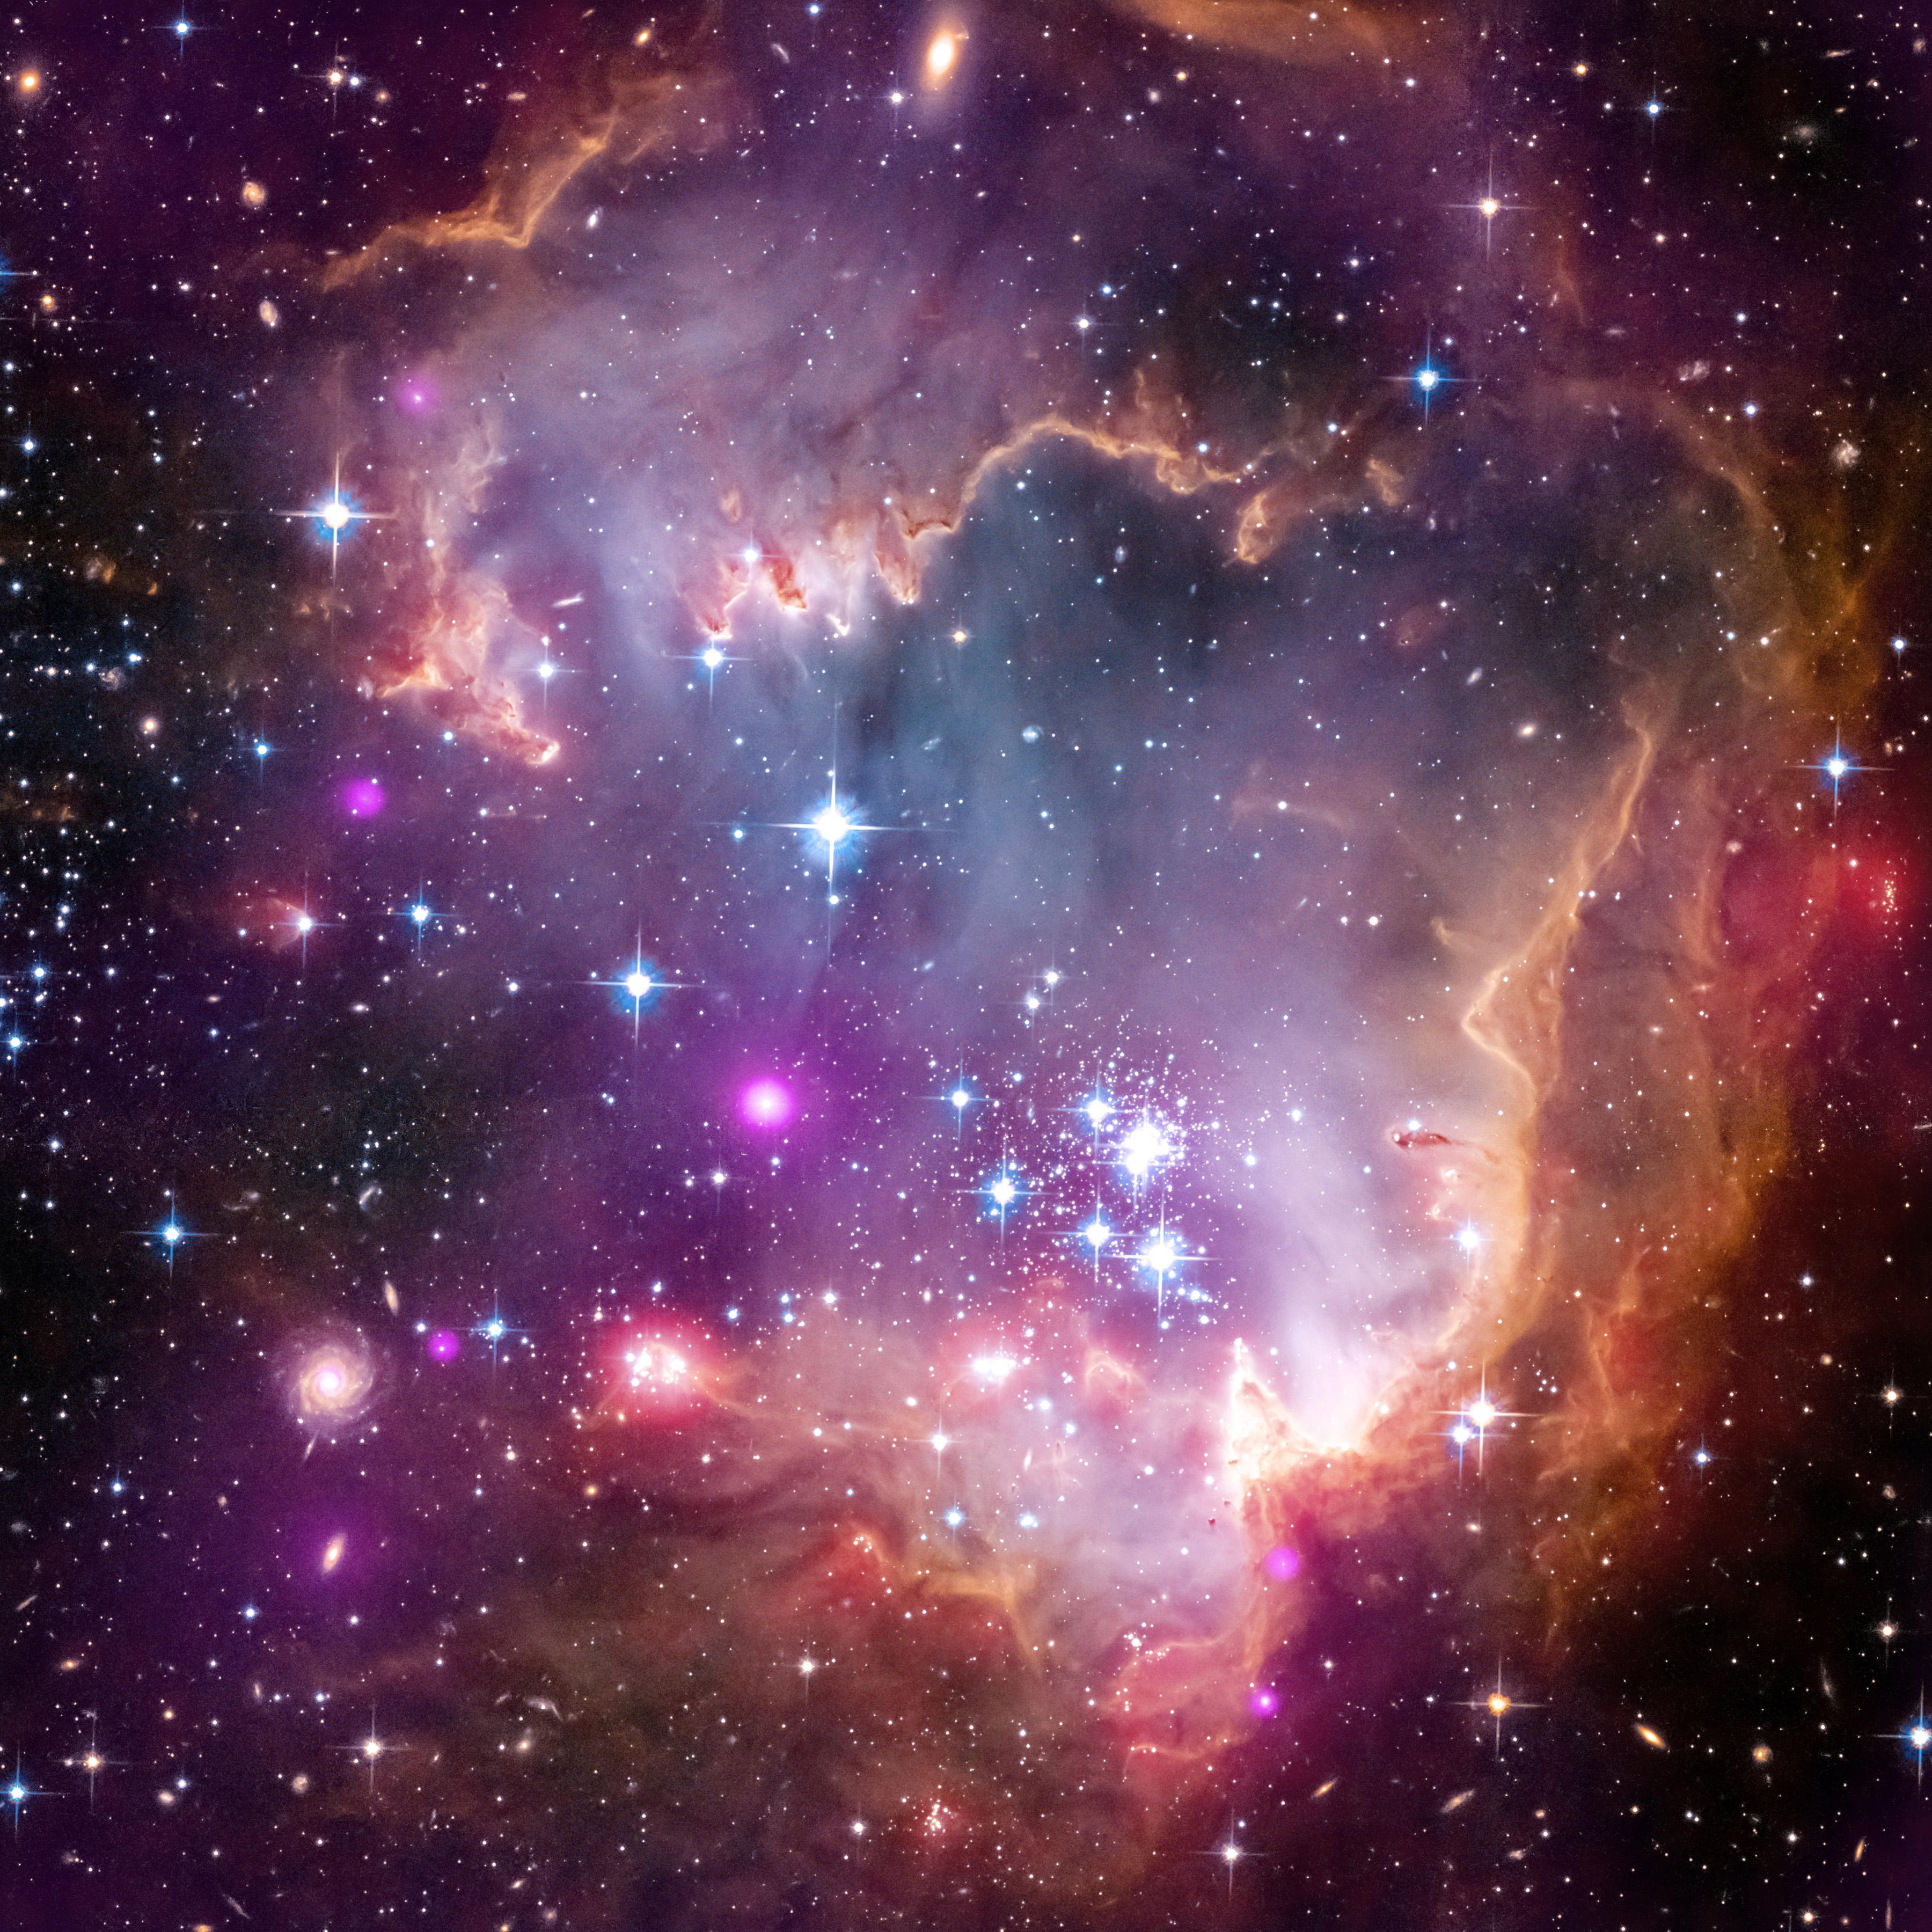 Space p0rn.